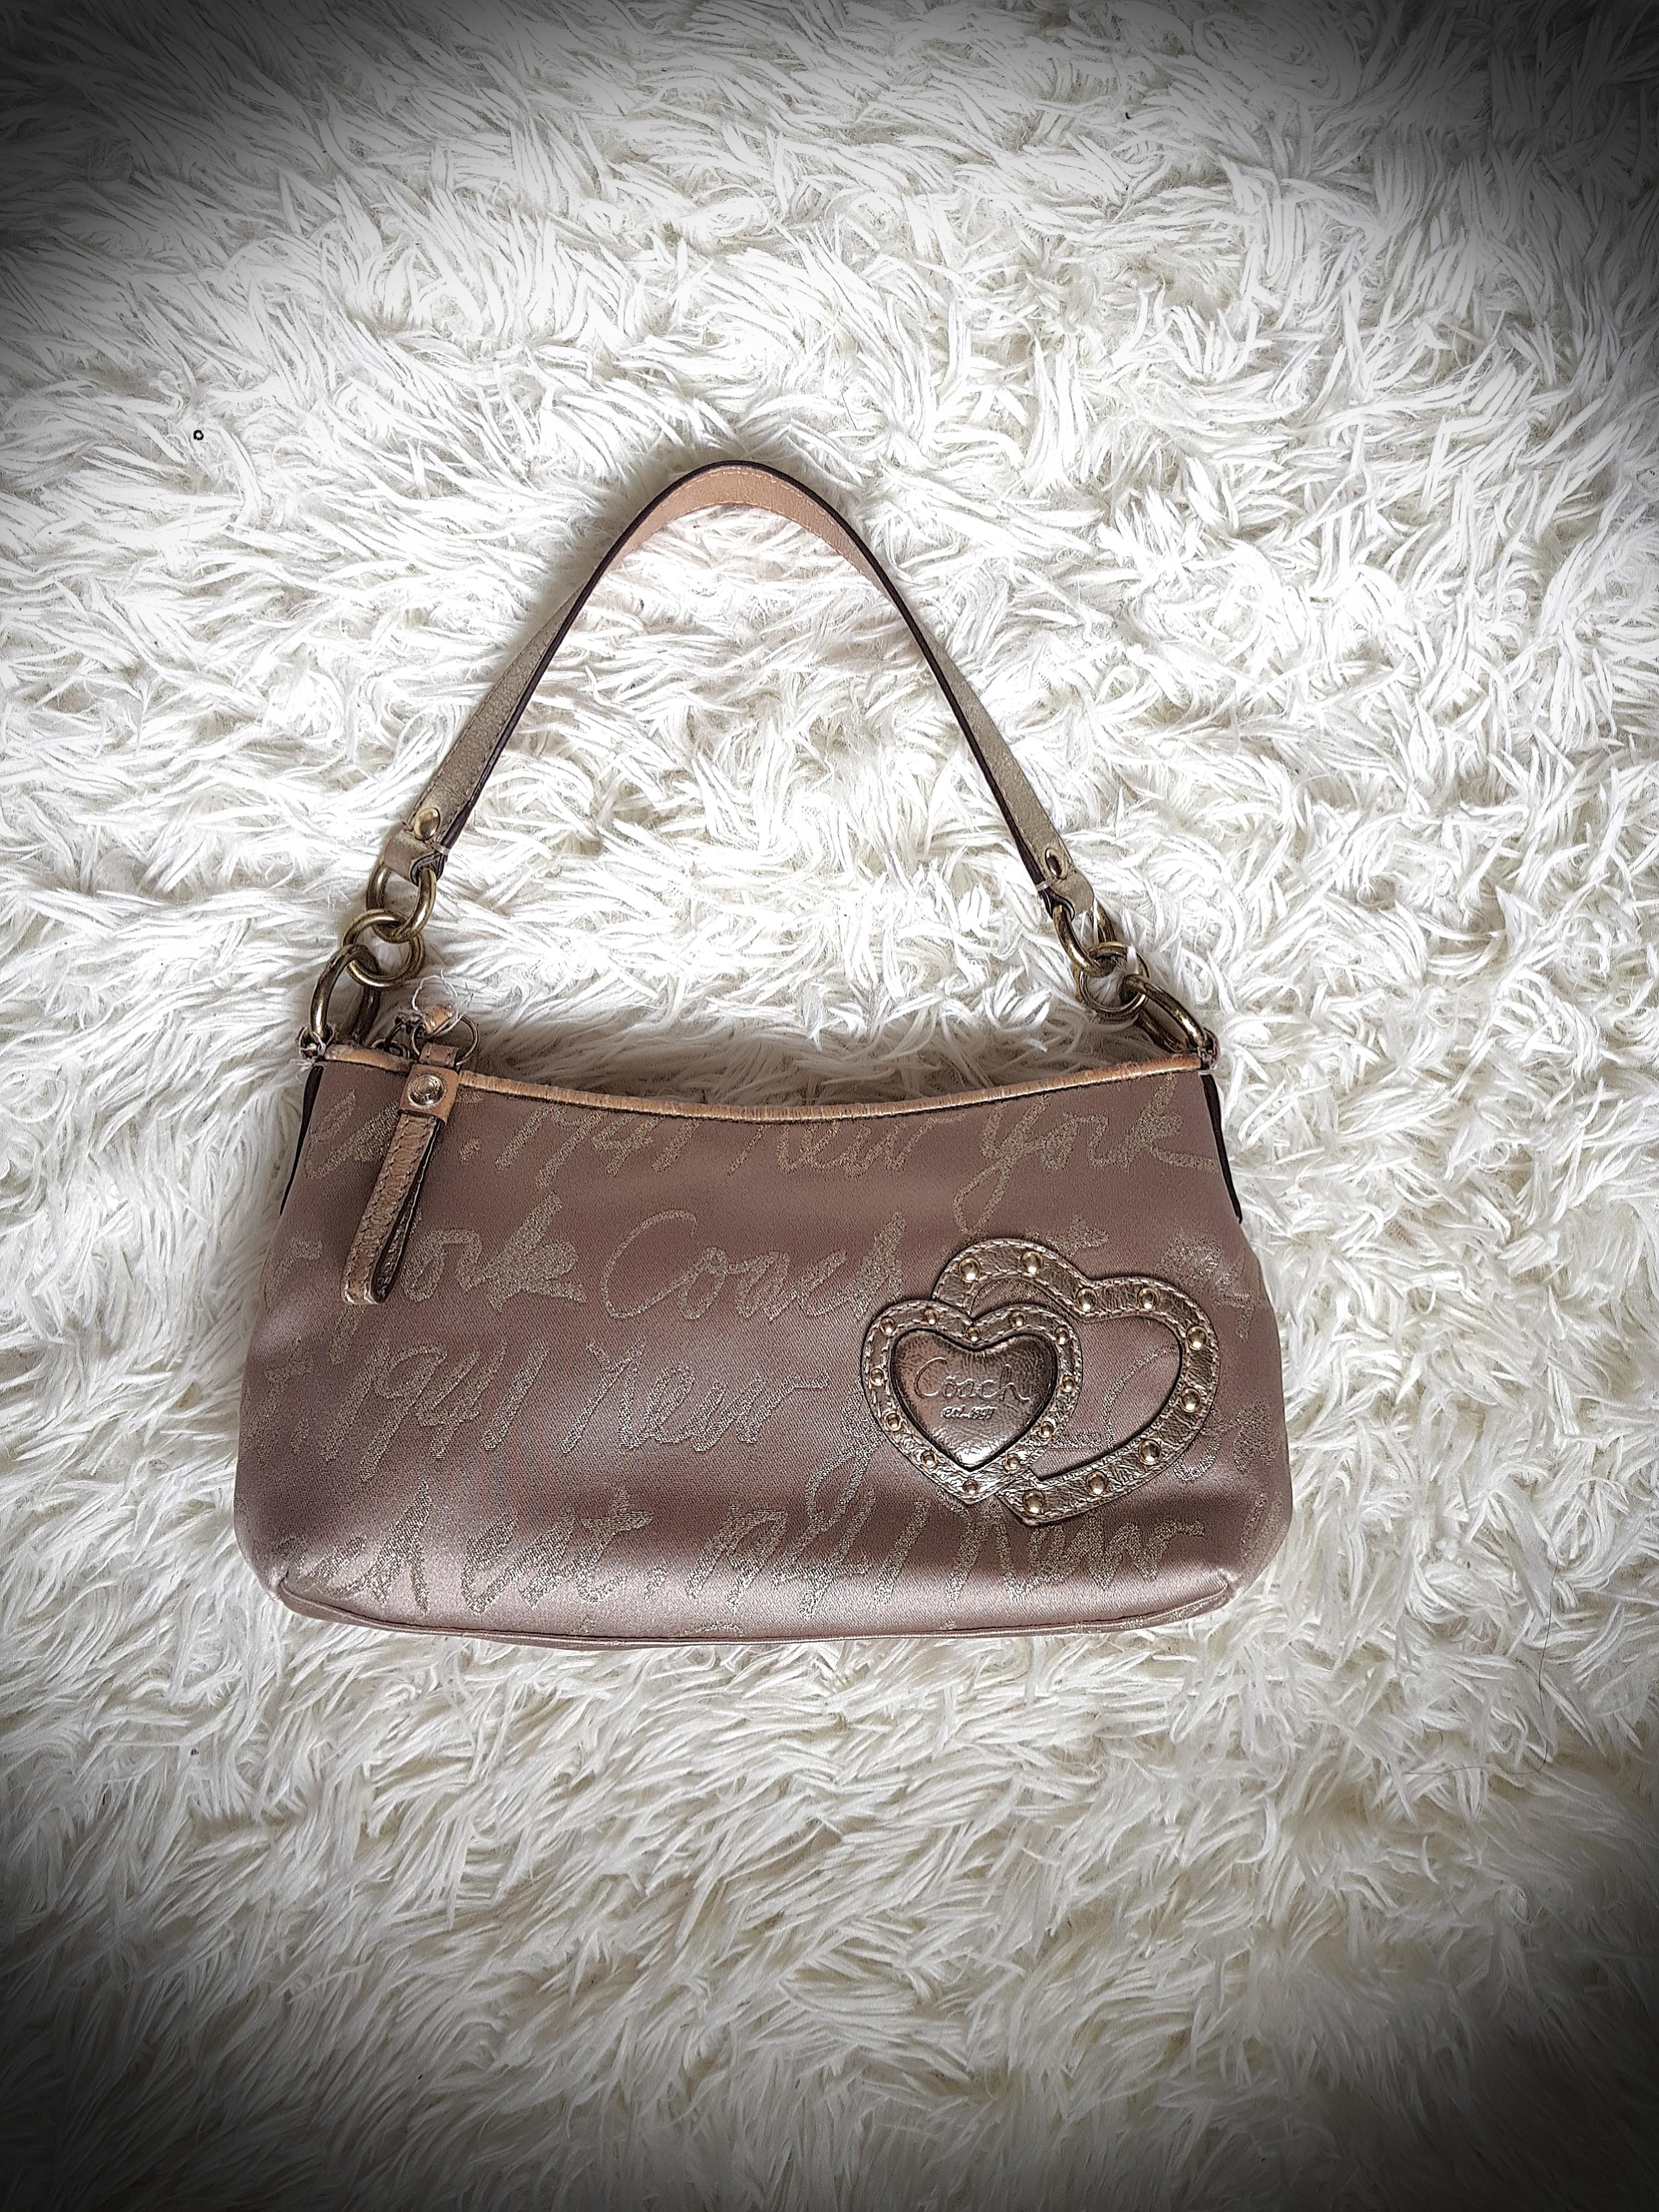 7cb22196e755 canada old coach bag cheap sale womens fashion bags wallets sling bags on  carousell 3fe4b 2d457